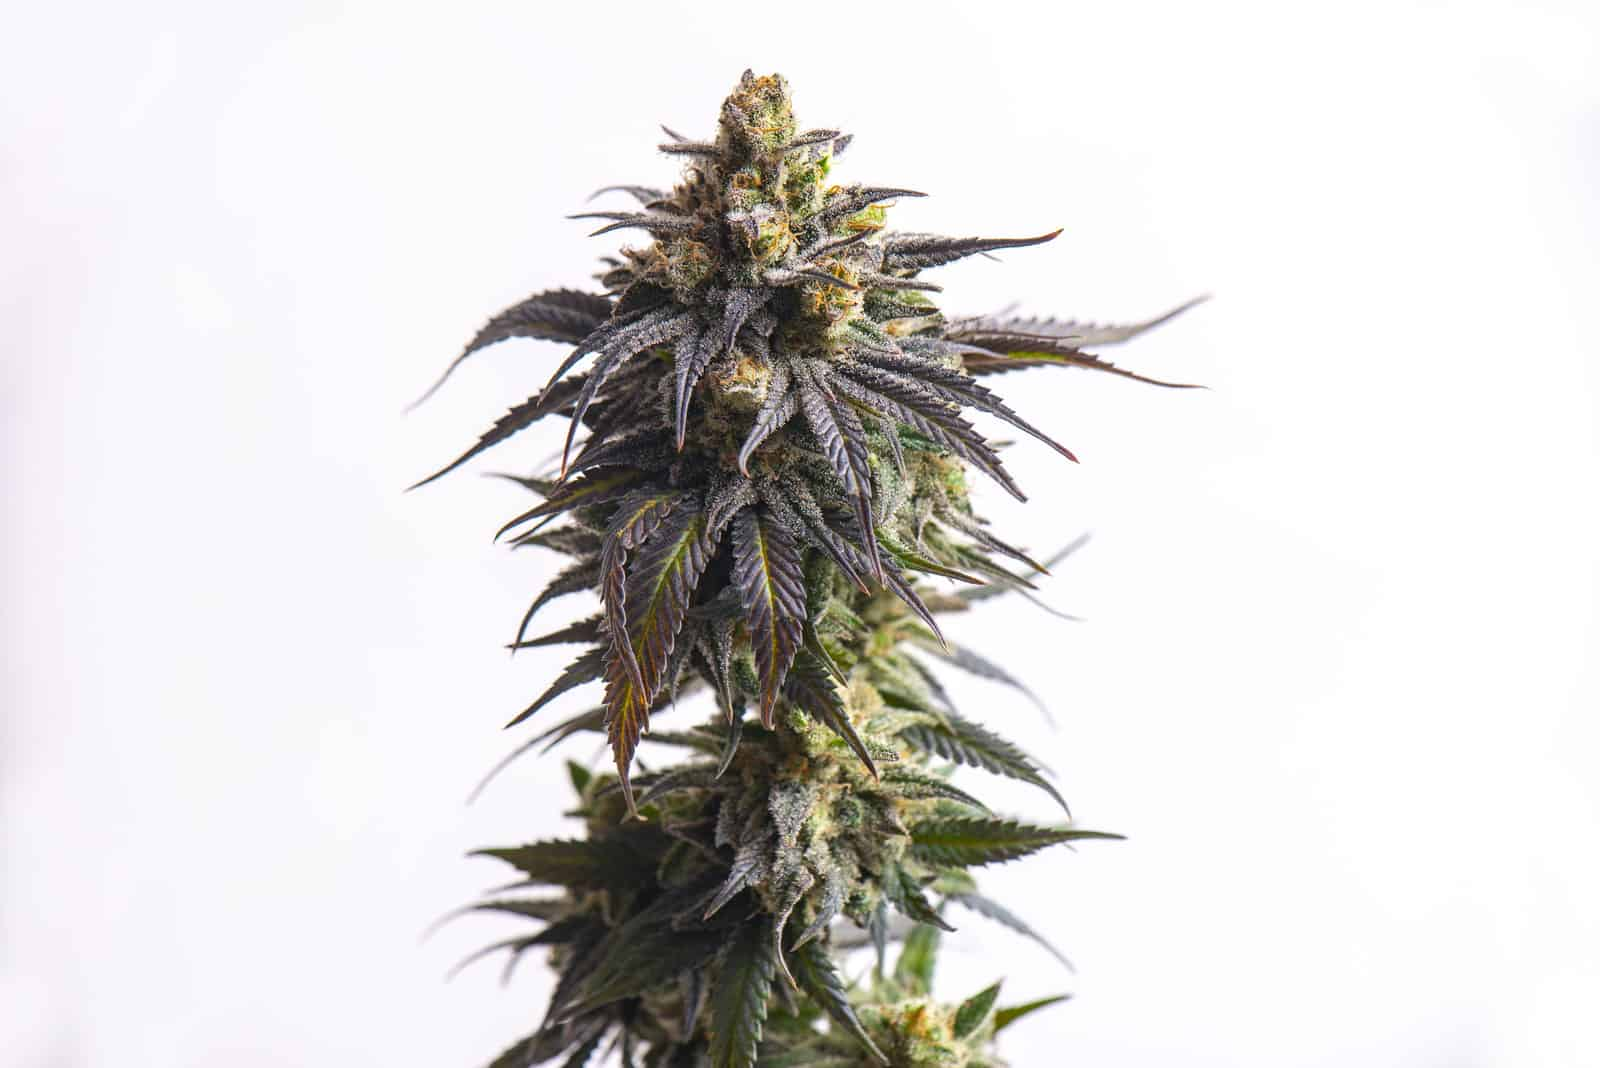 Wedding cake strain overview. Cannabis plant.